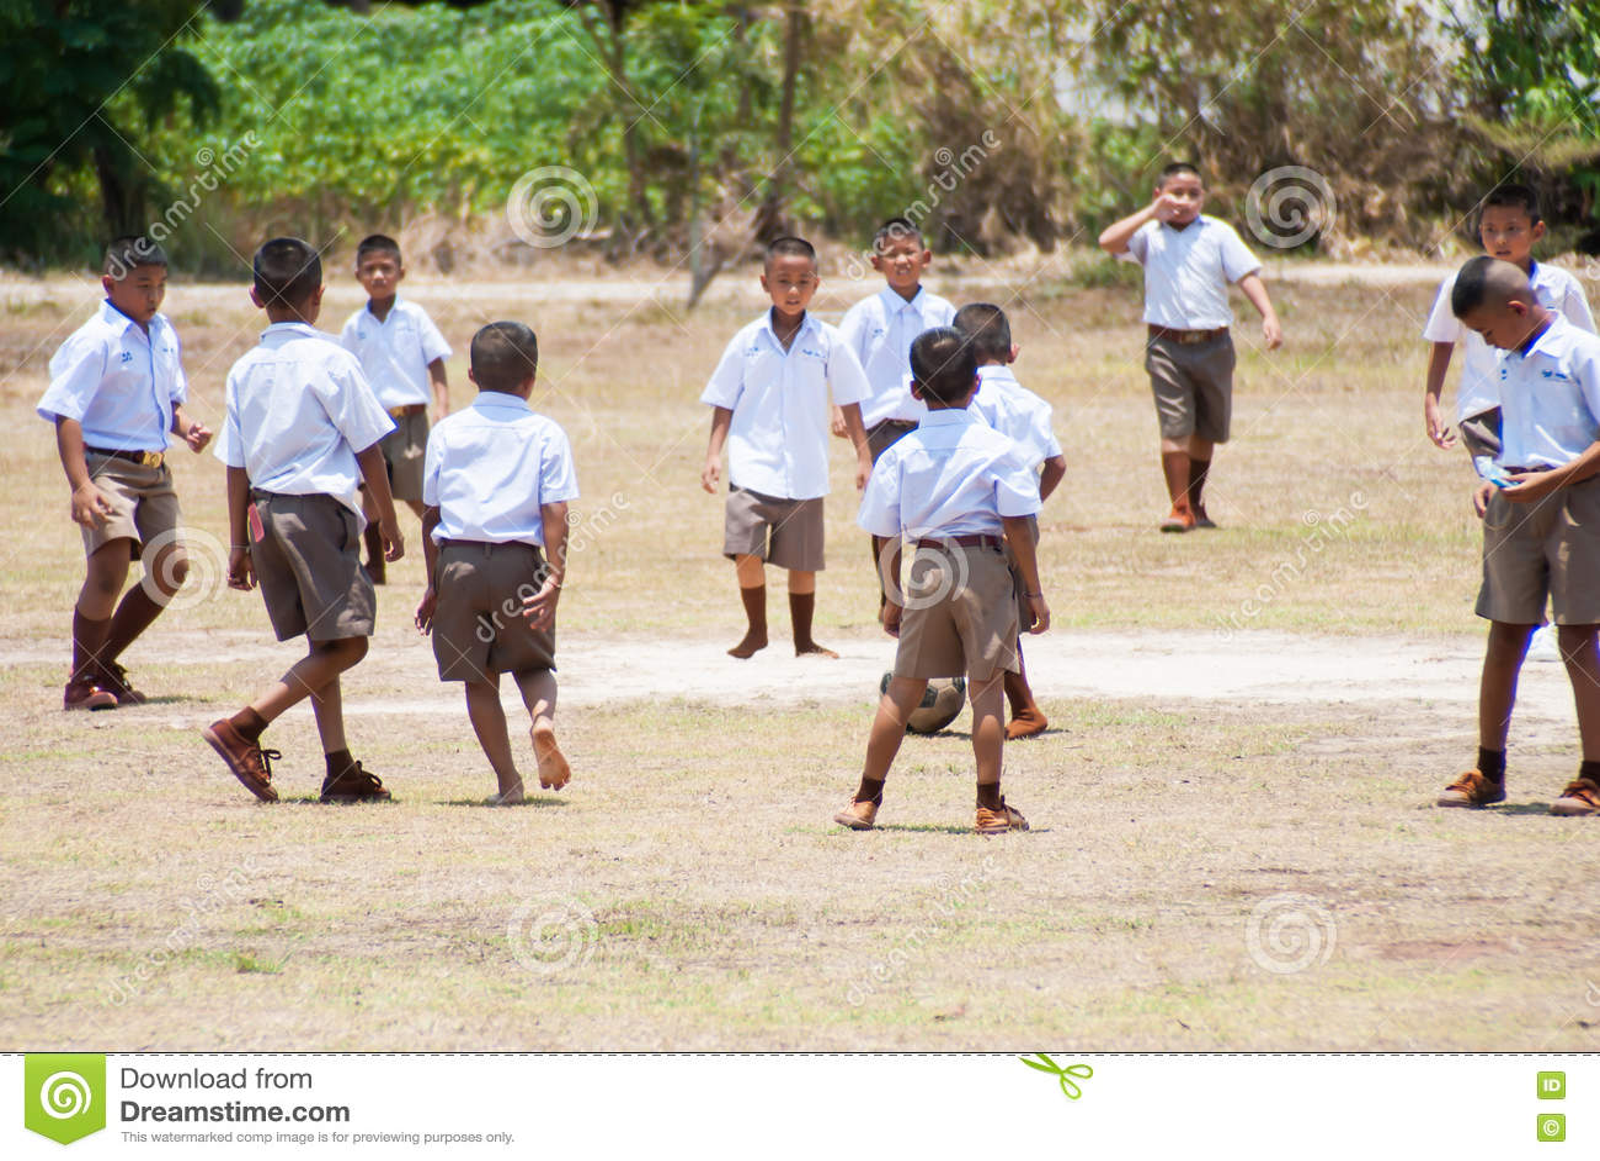 Tajlandzki dziecko sztuki futbol